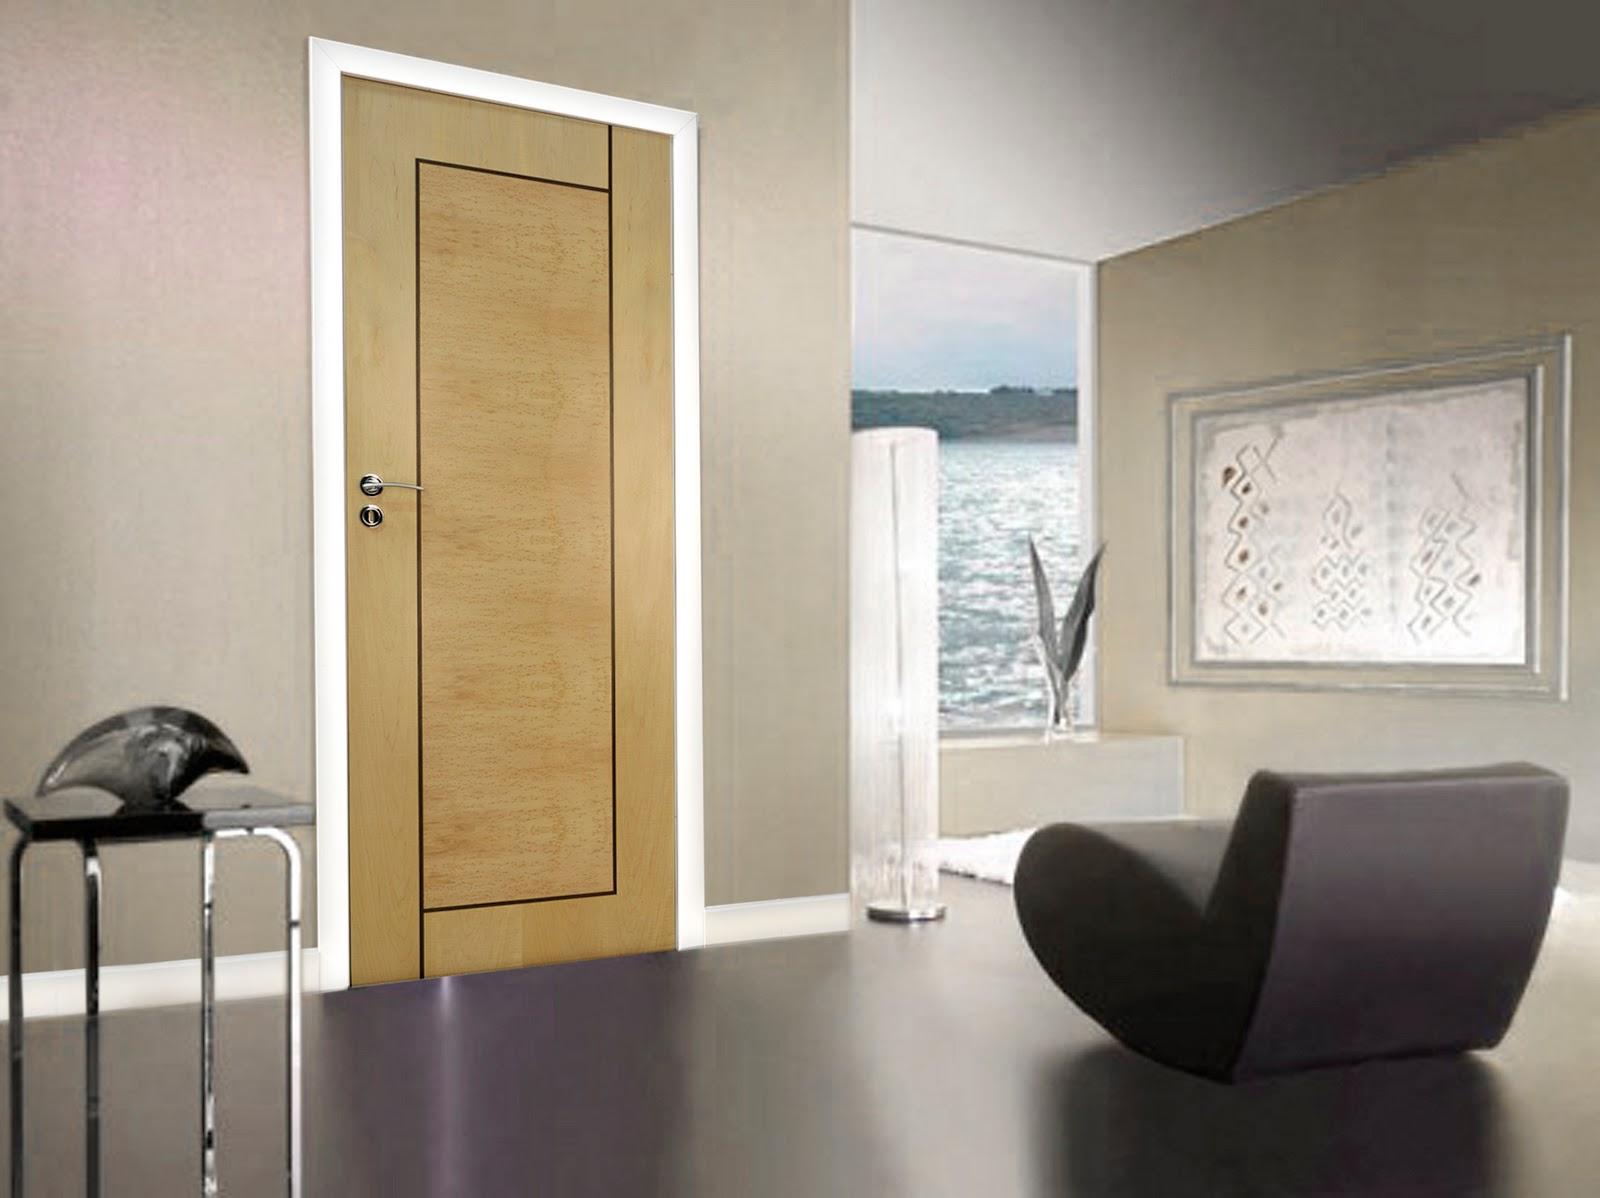 Mark 1 Photography: Designer doors and modern interiors